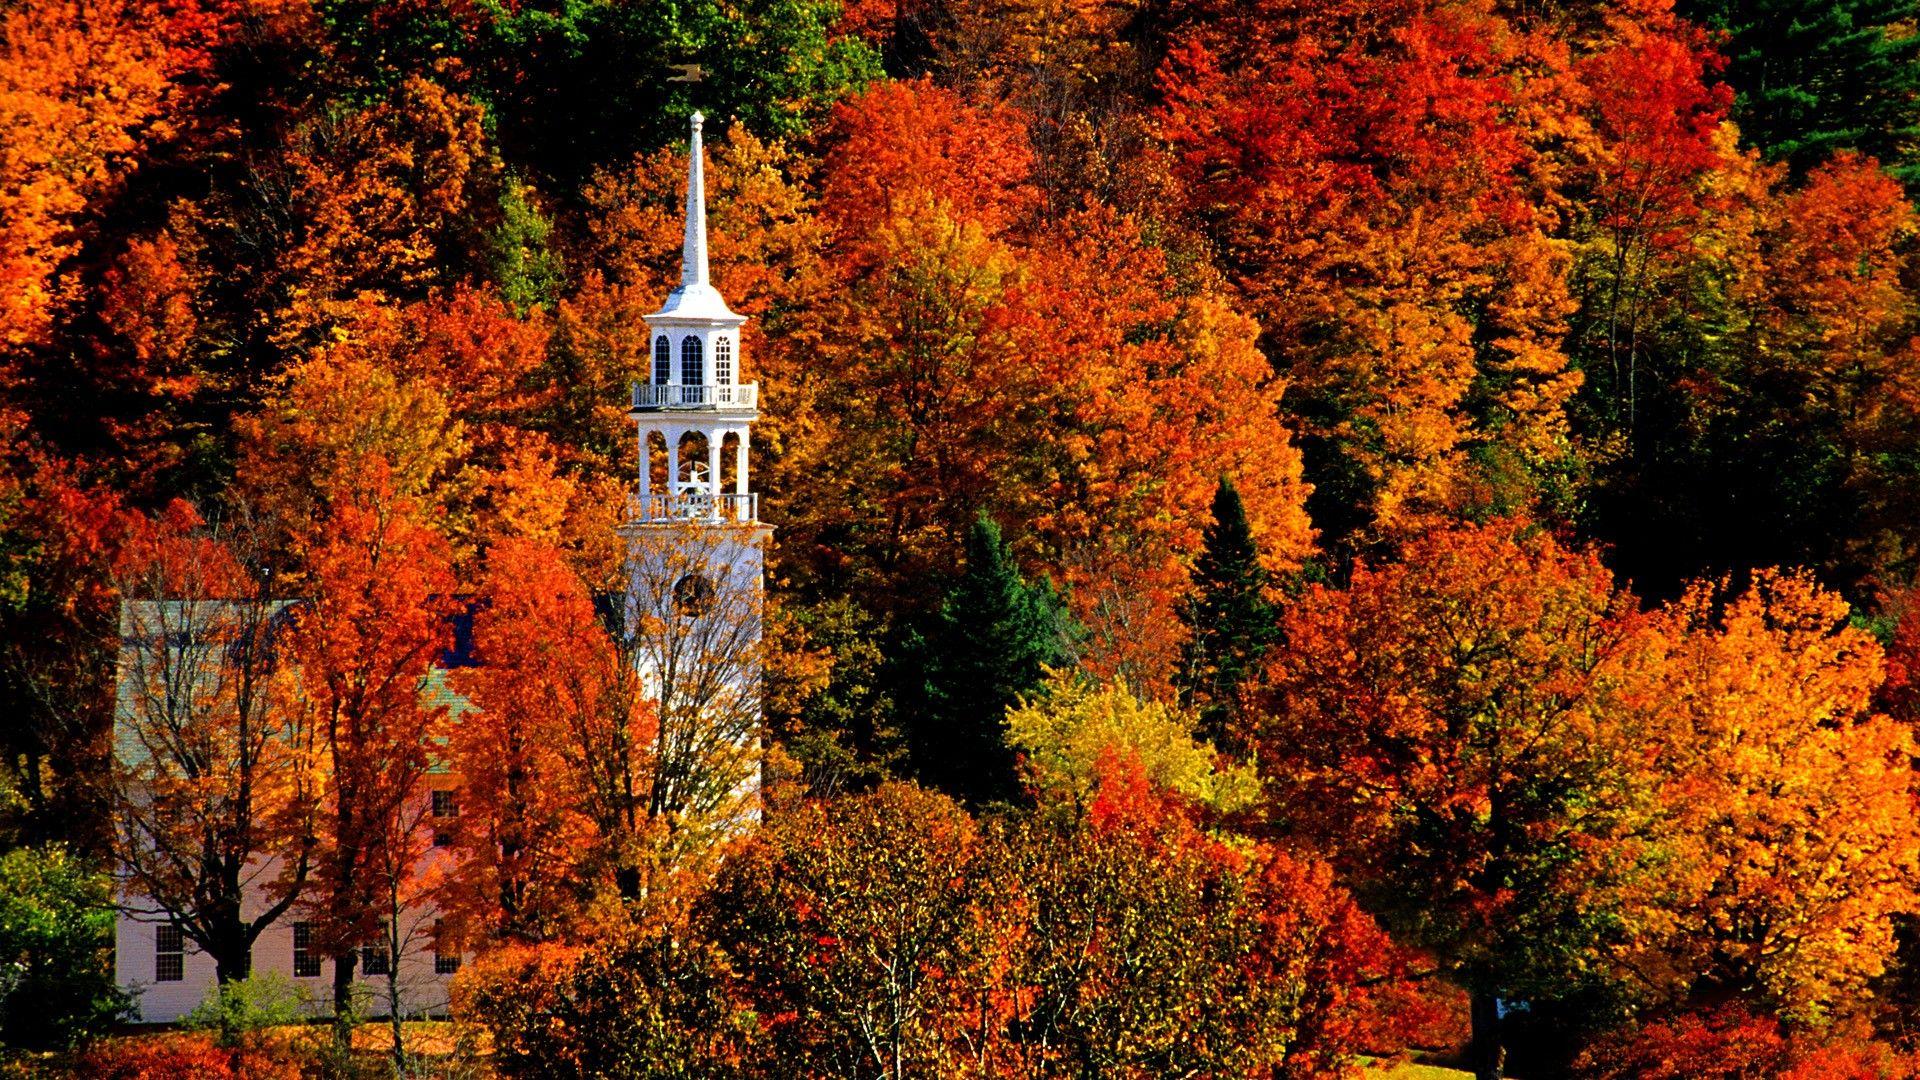 Church In Peak Fall Color Strafford 1920x1080 Full Hd Wallpaper Vermont Fall New England Fall Fall Foliage